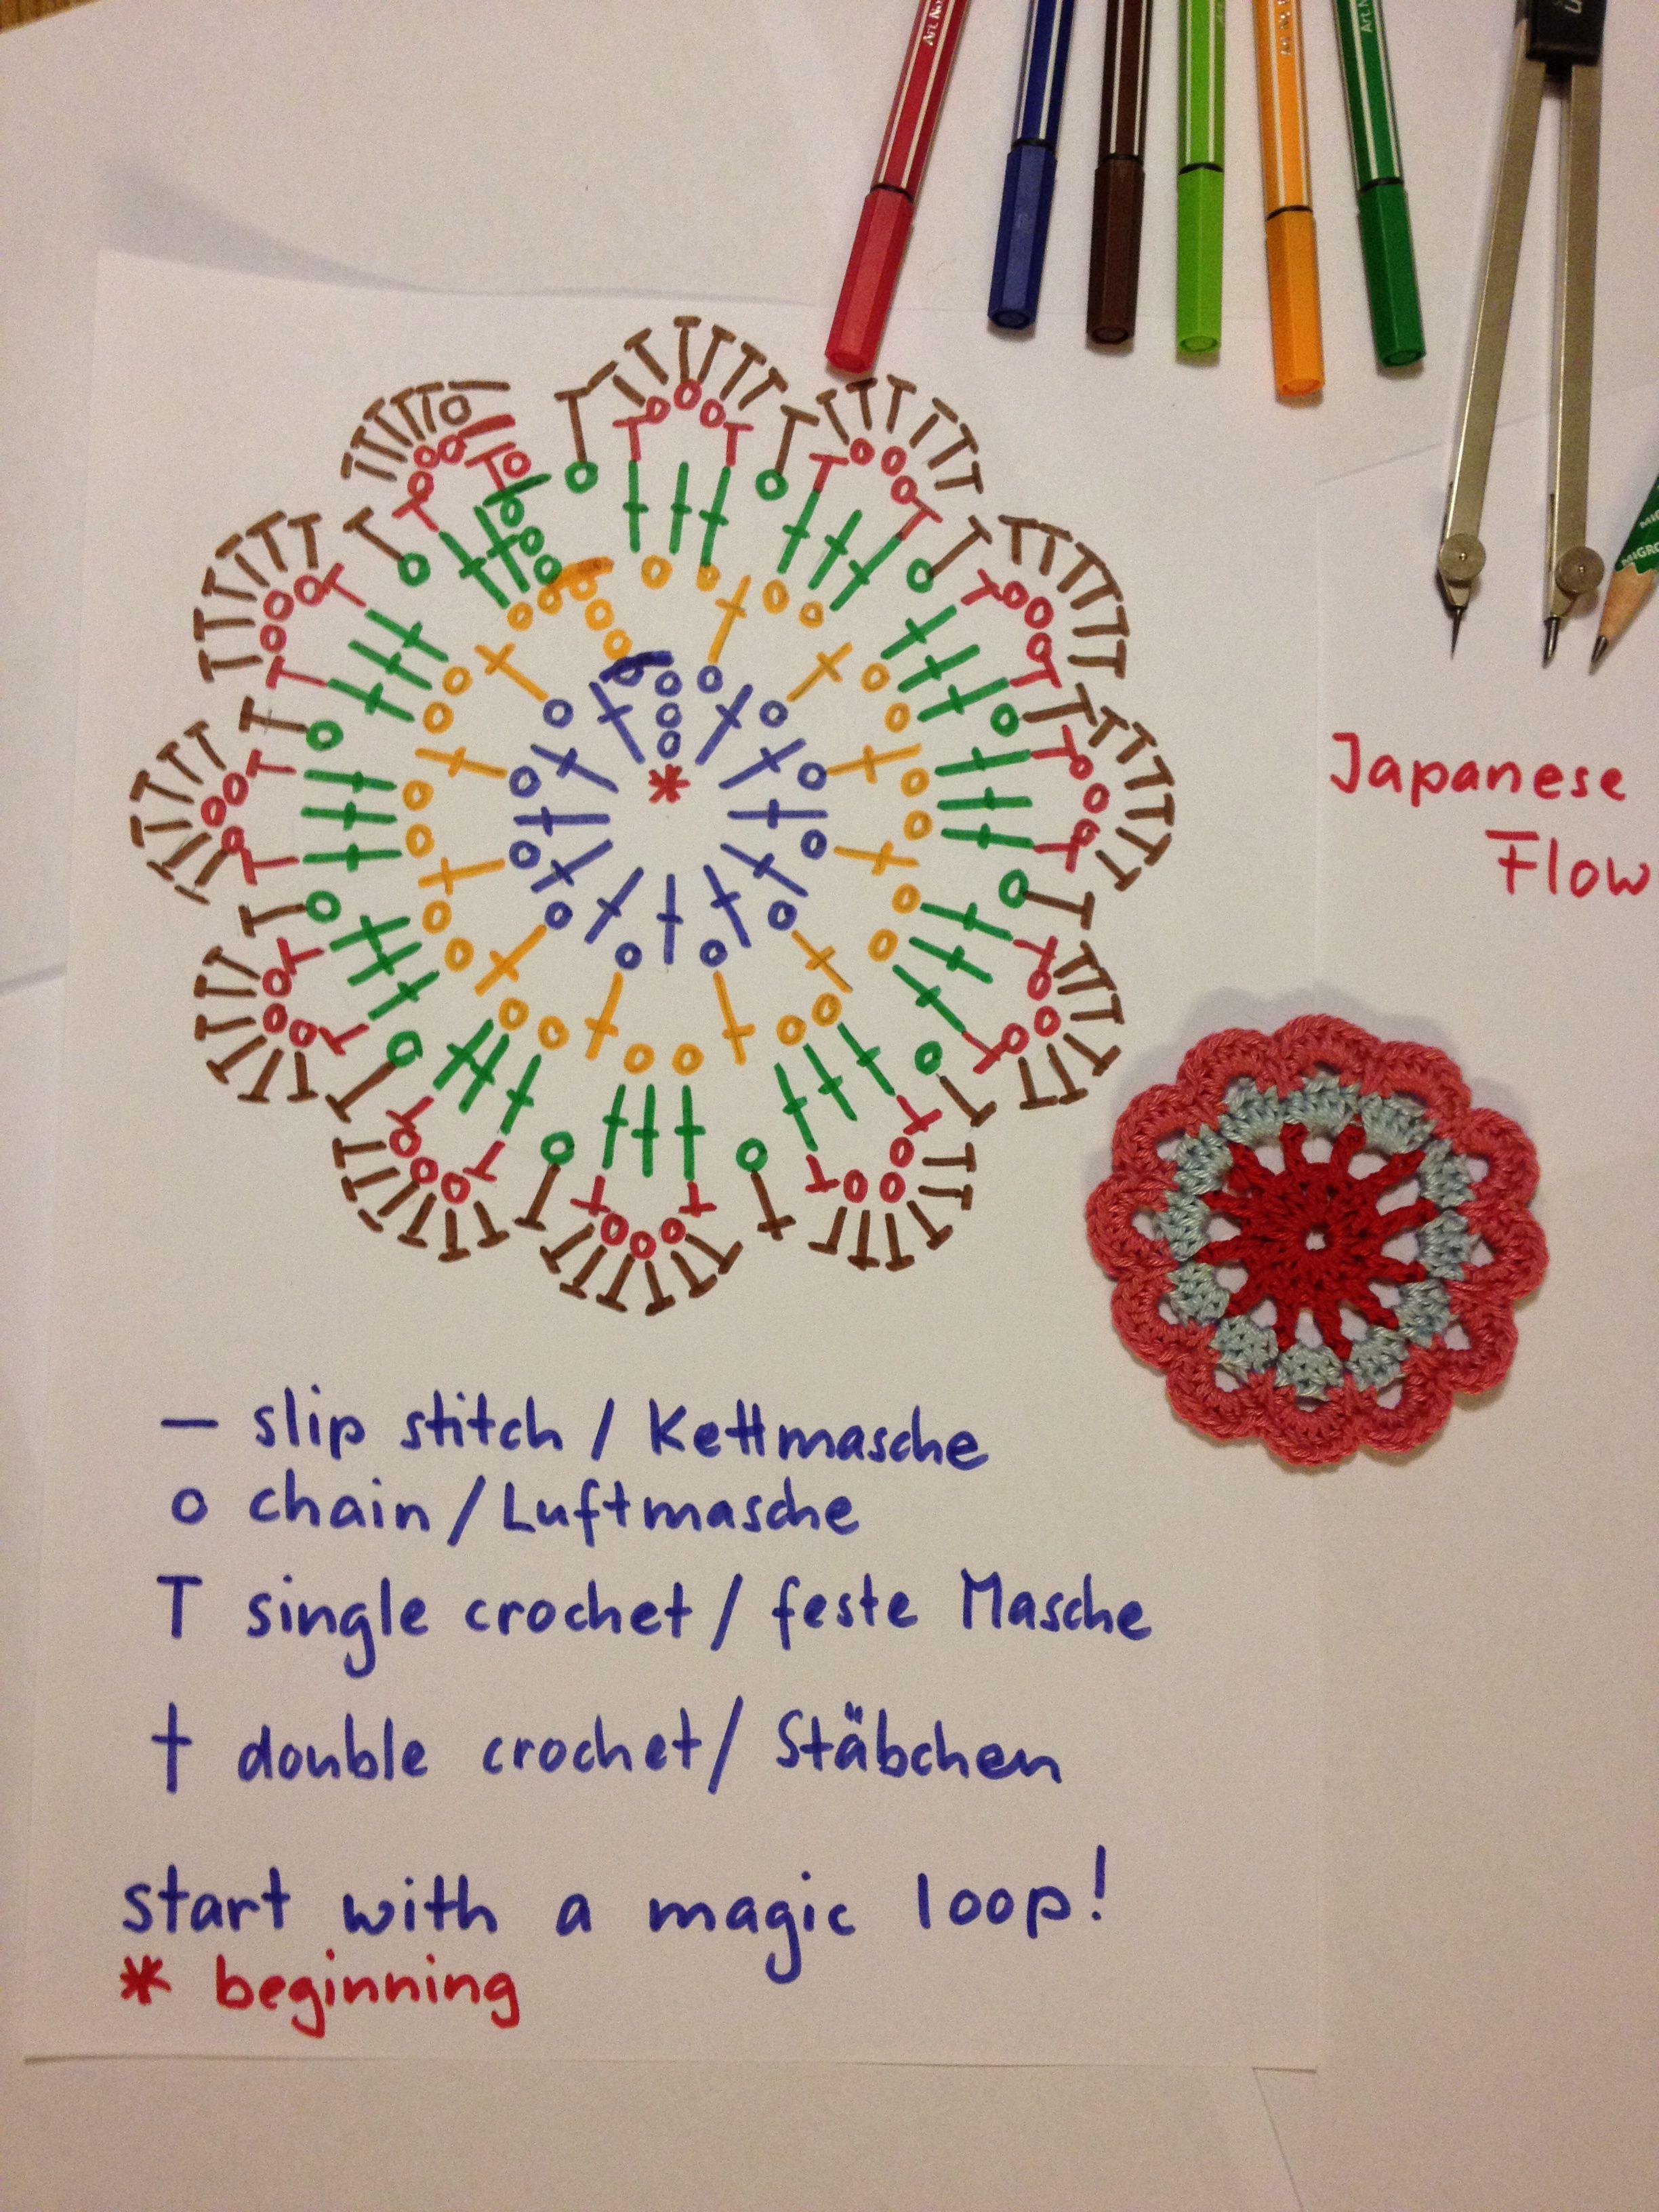 Grafico flor japonesa | Crochet | Pinterest | Flores japonesas, Flor ...